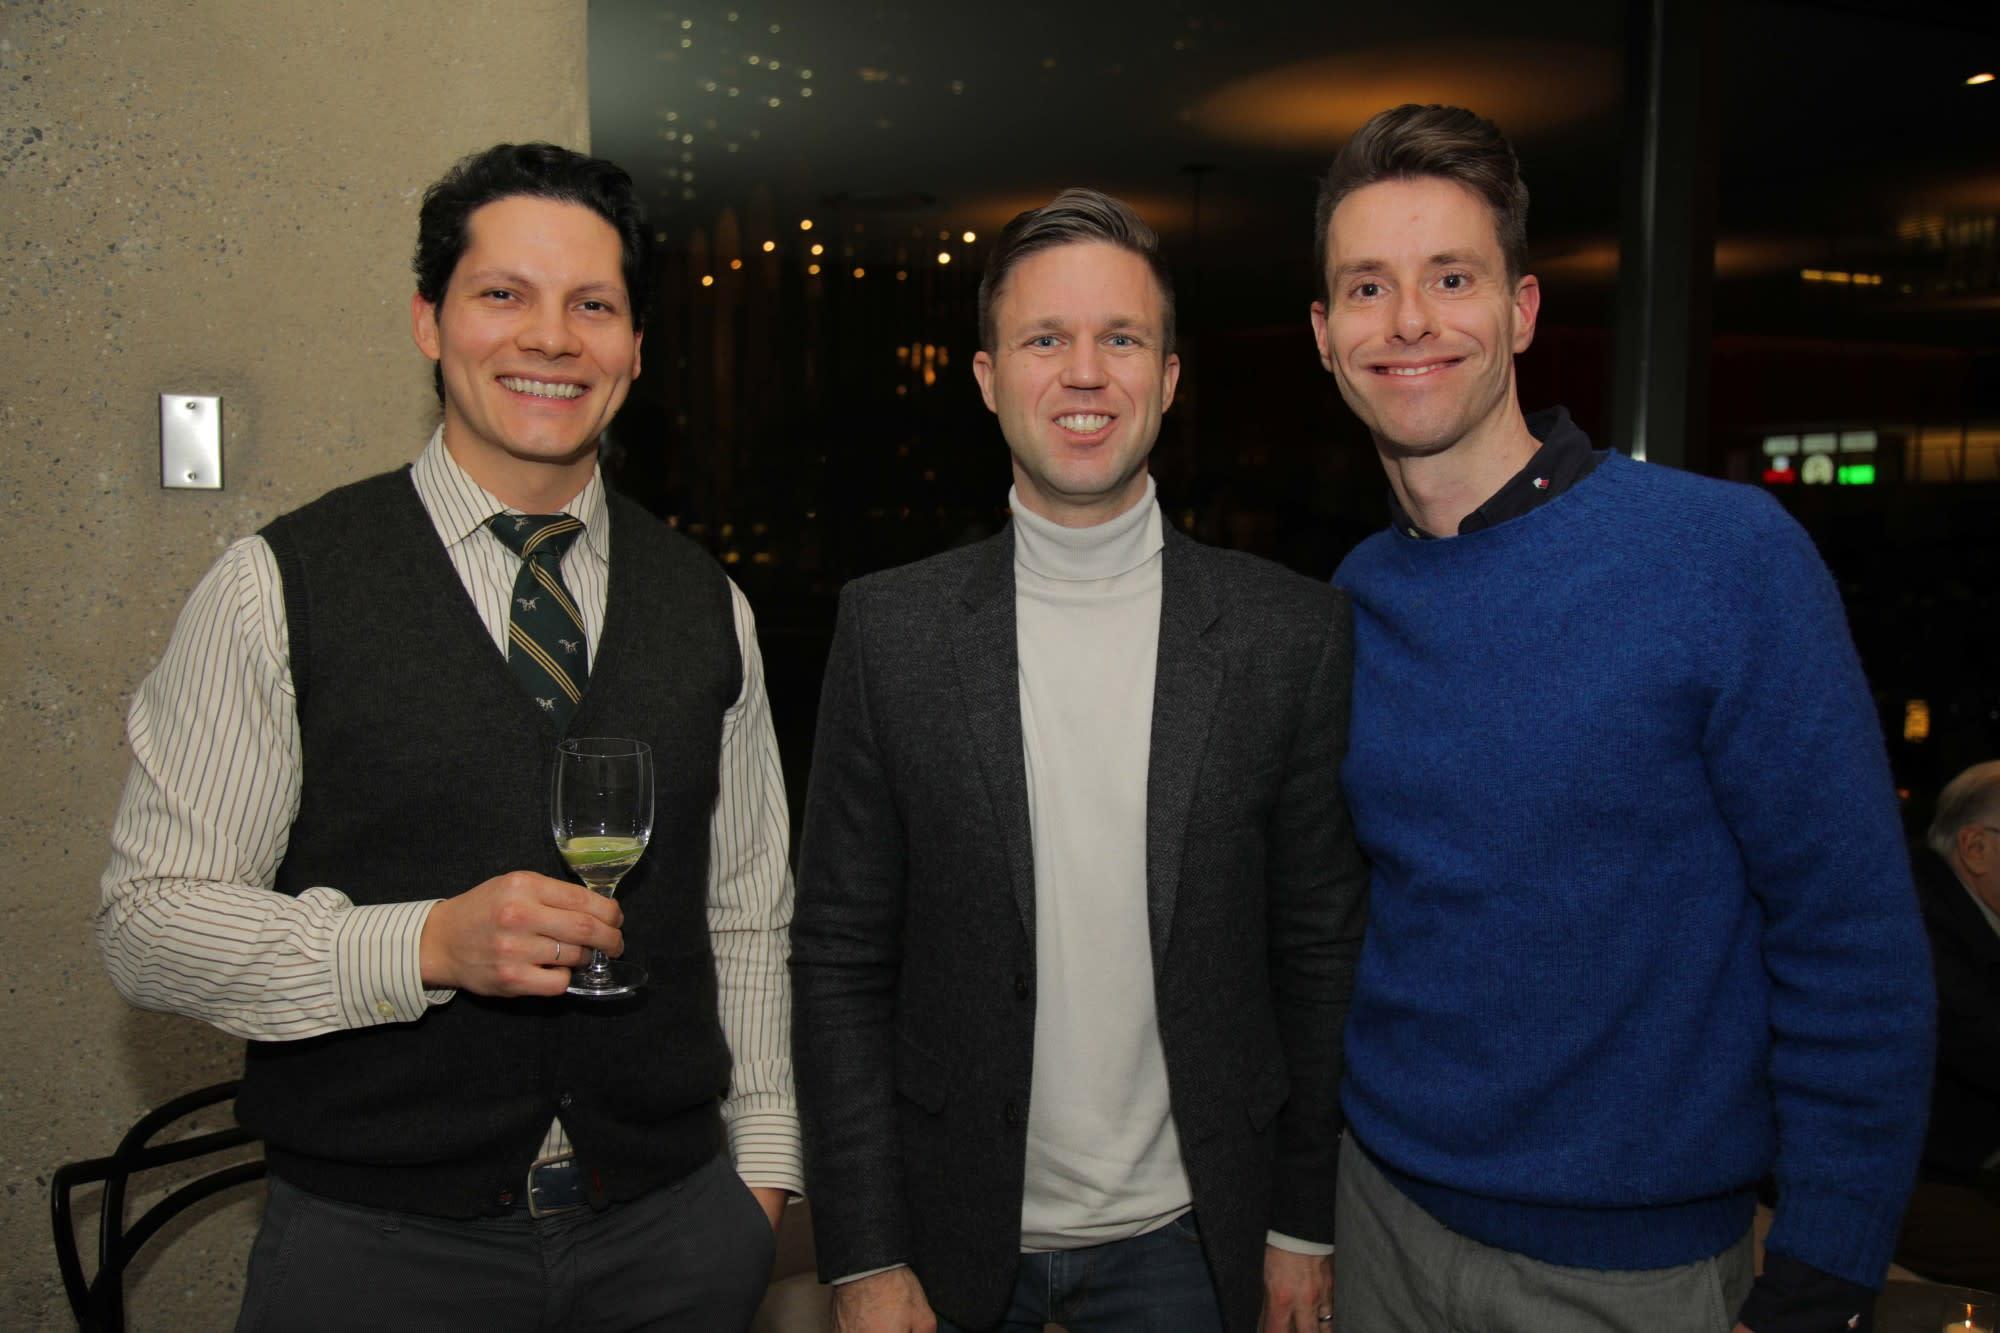 Mark Franks, Matthew Reeg, Jordan Agee